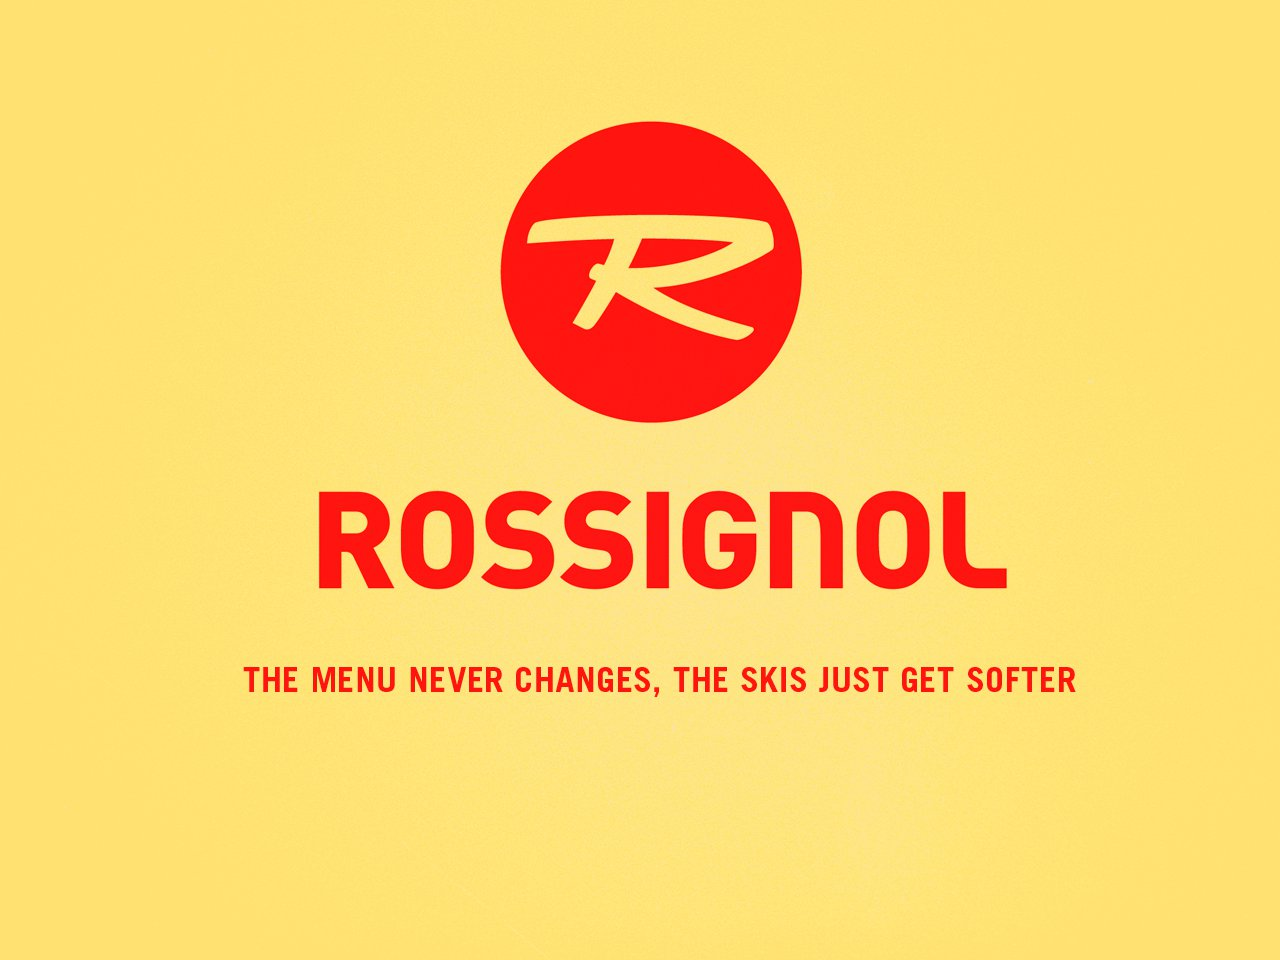 Honest Ski Company Slogans - Rossignol